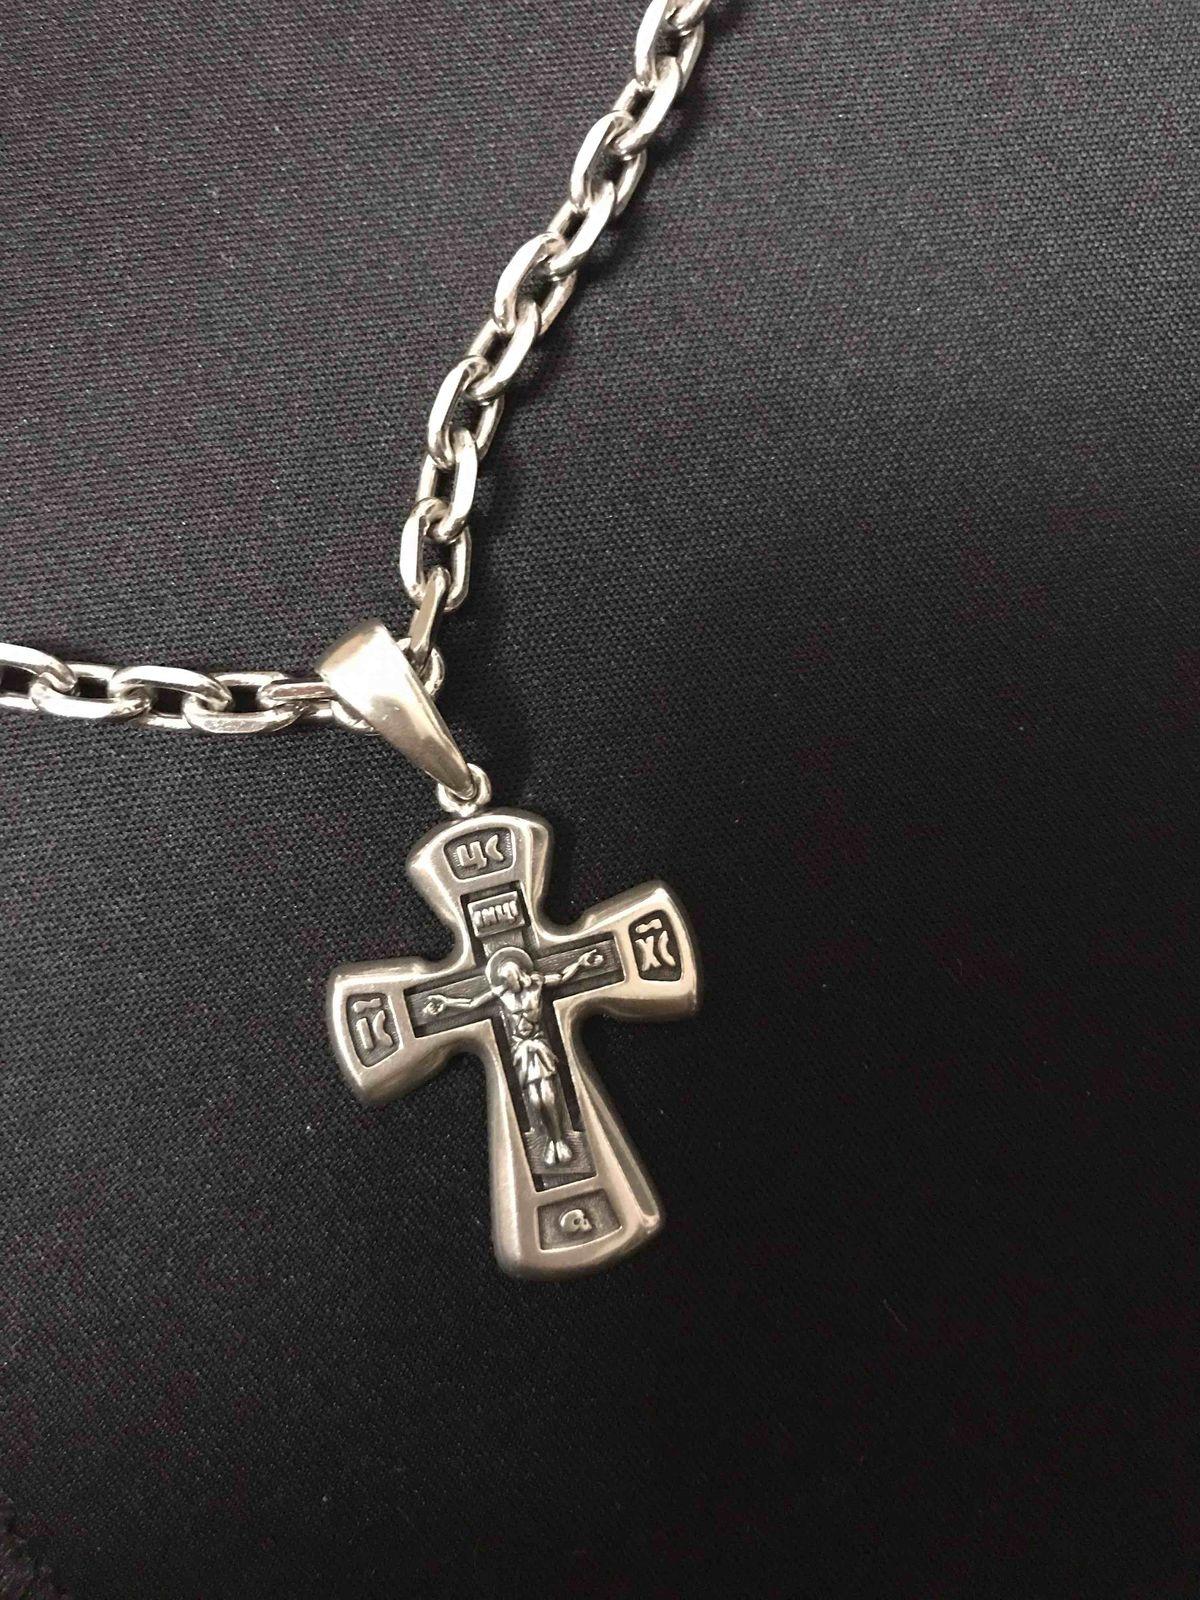 Мужской крест «Спаси сохрани»